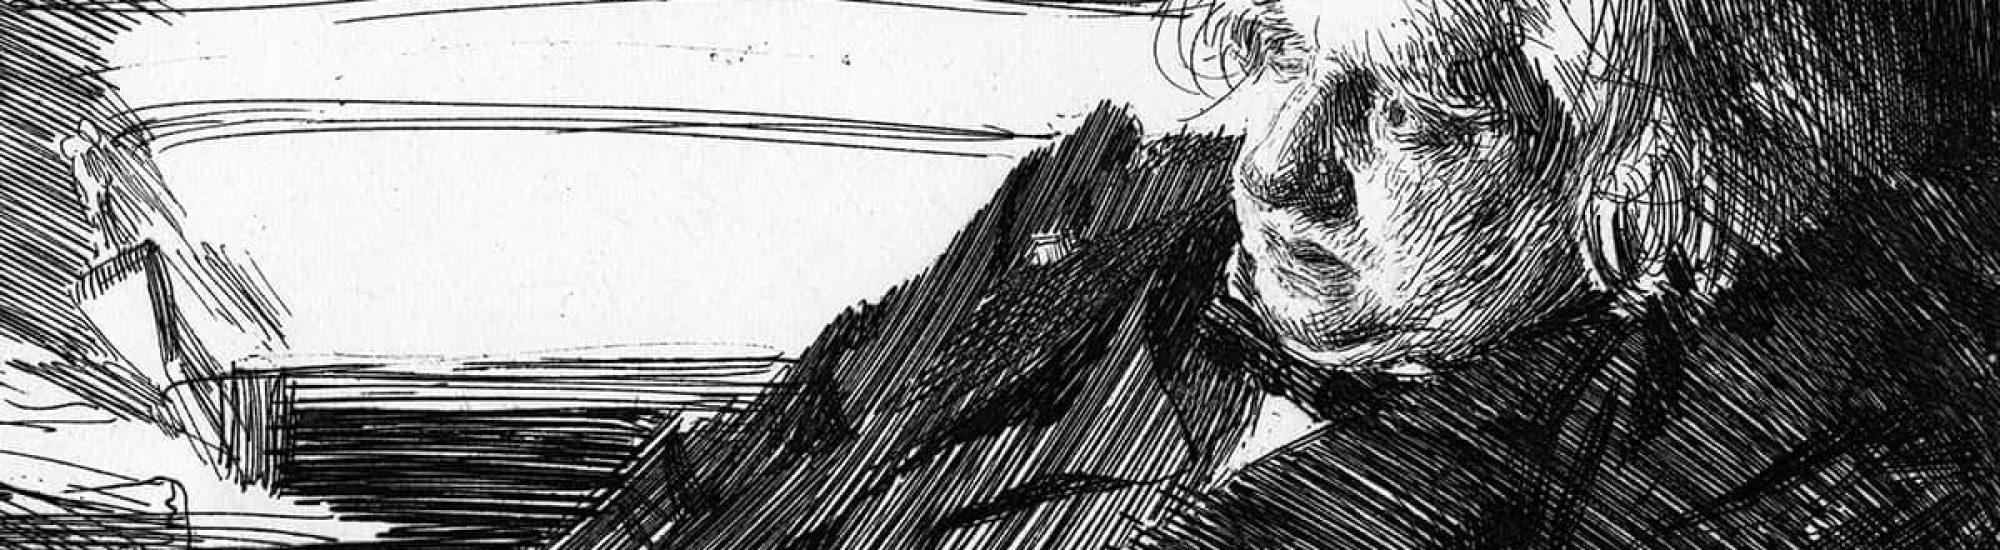 dessiner à la hachure Anders Zorn